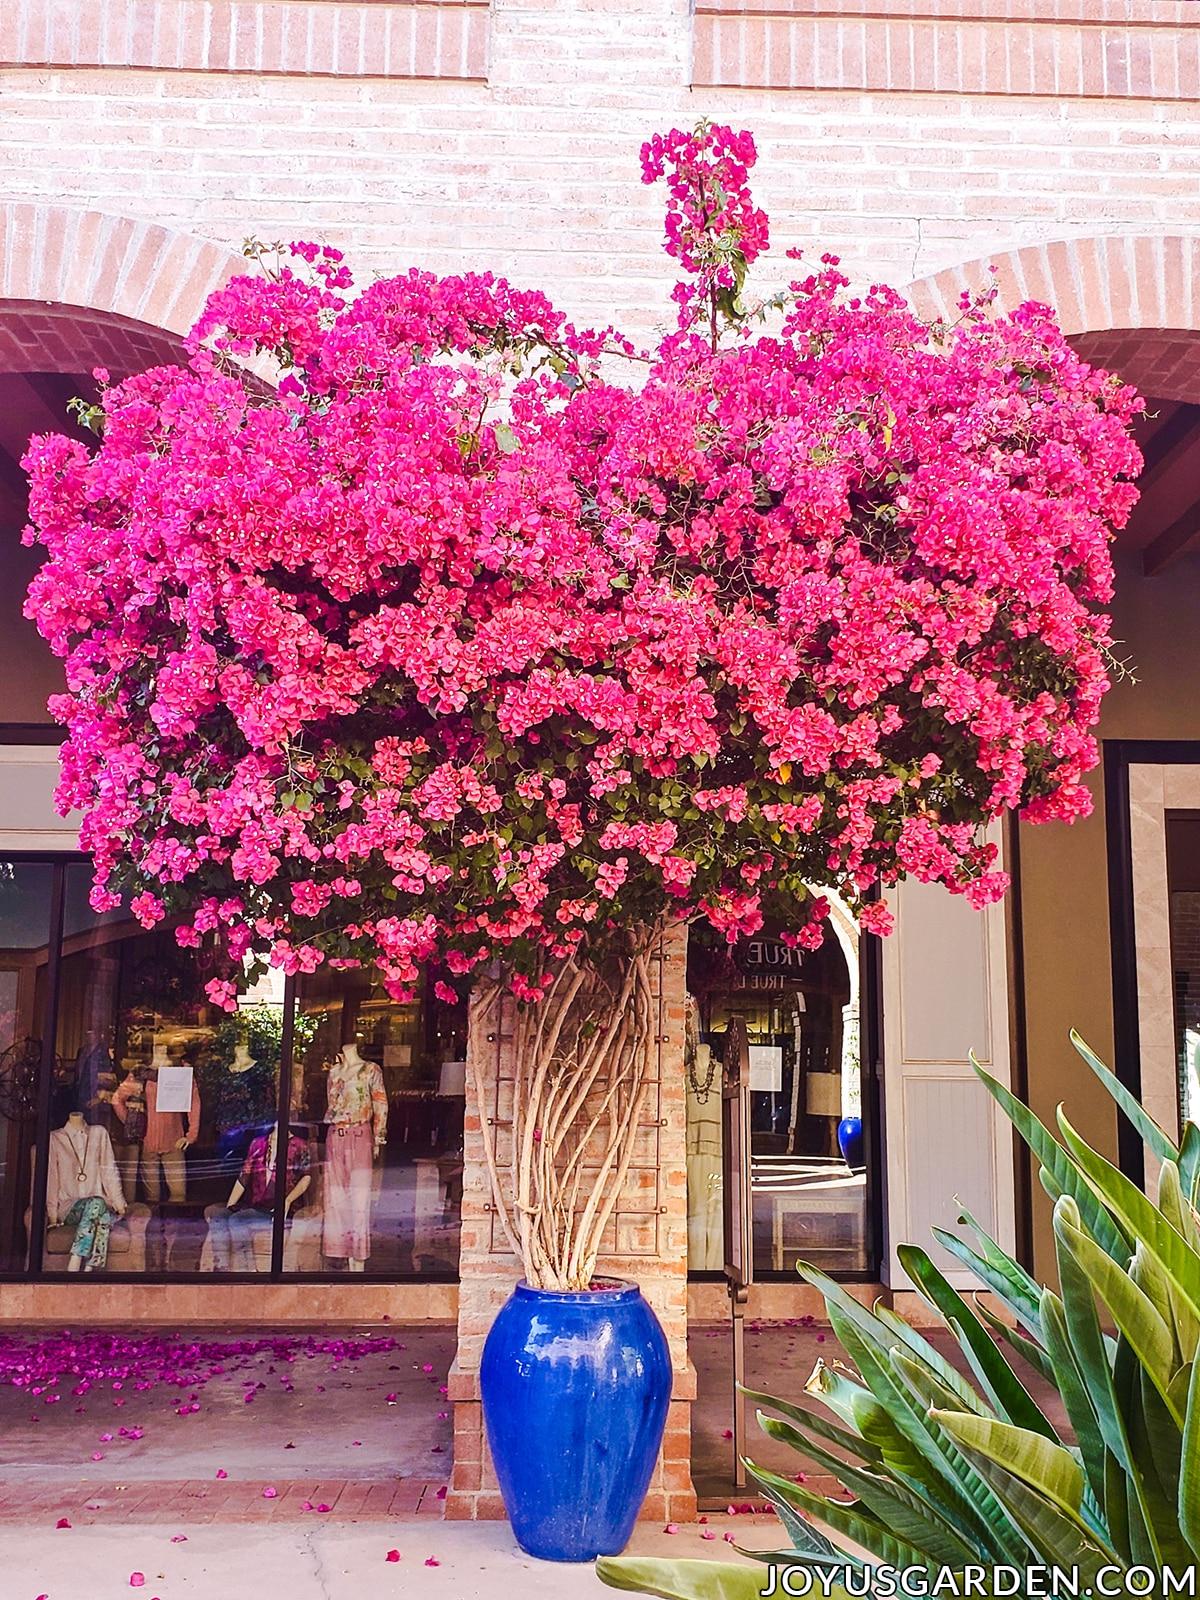 a beautiful deep rose bougainvillea in full bloom growing against a brick pillar in a tall deep blue ceramic